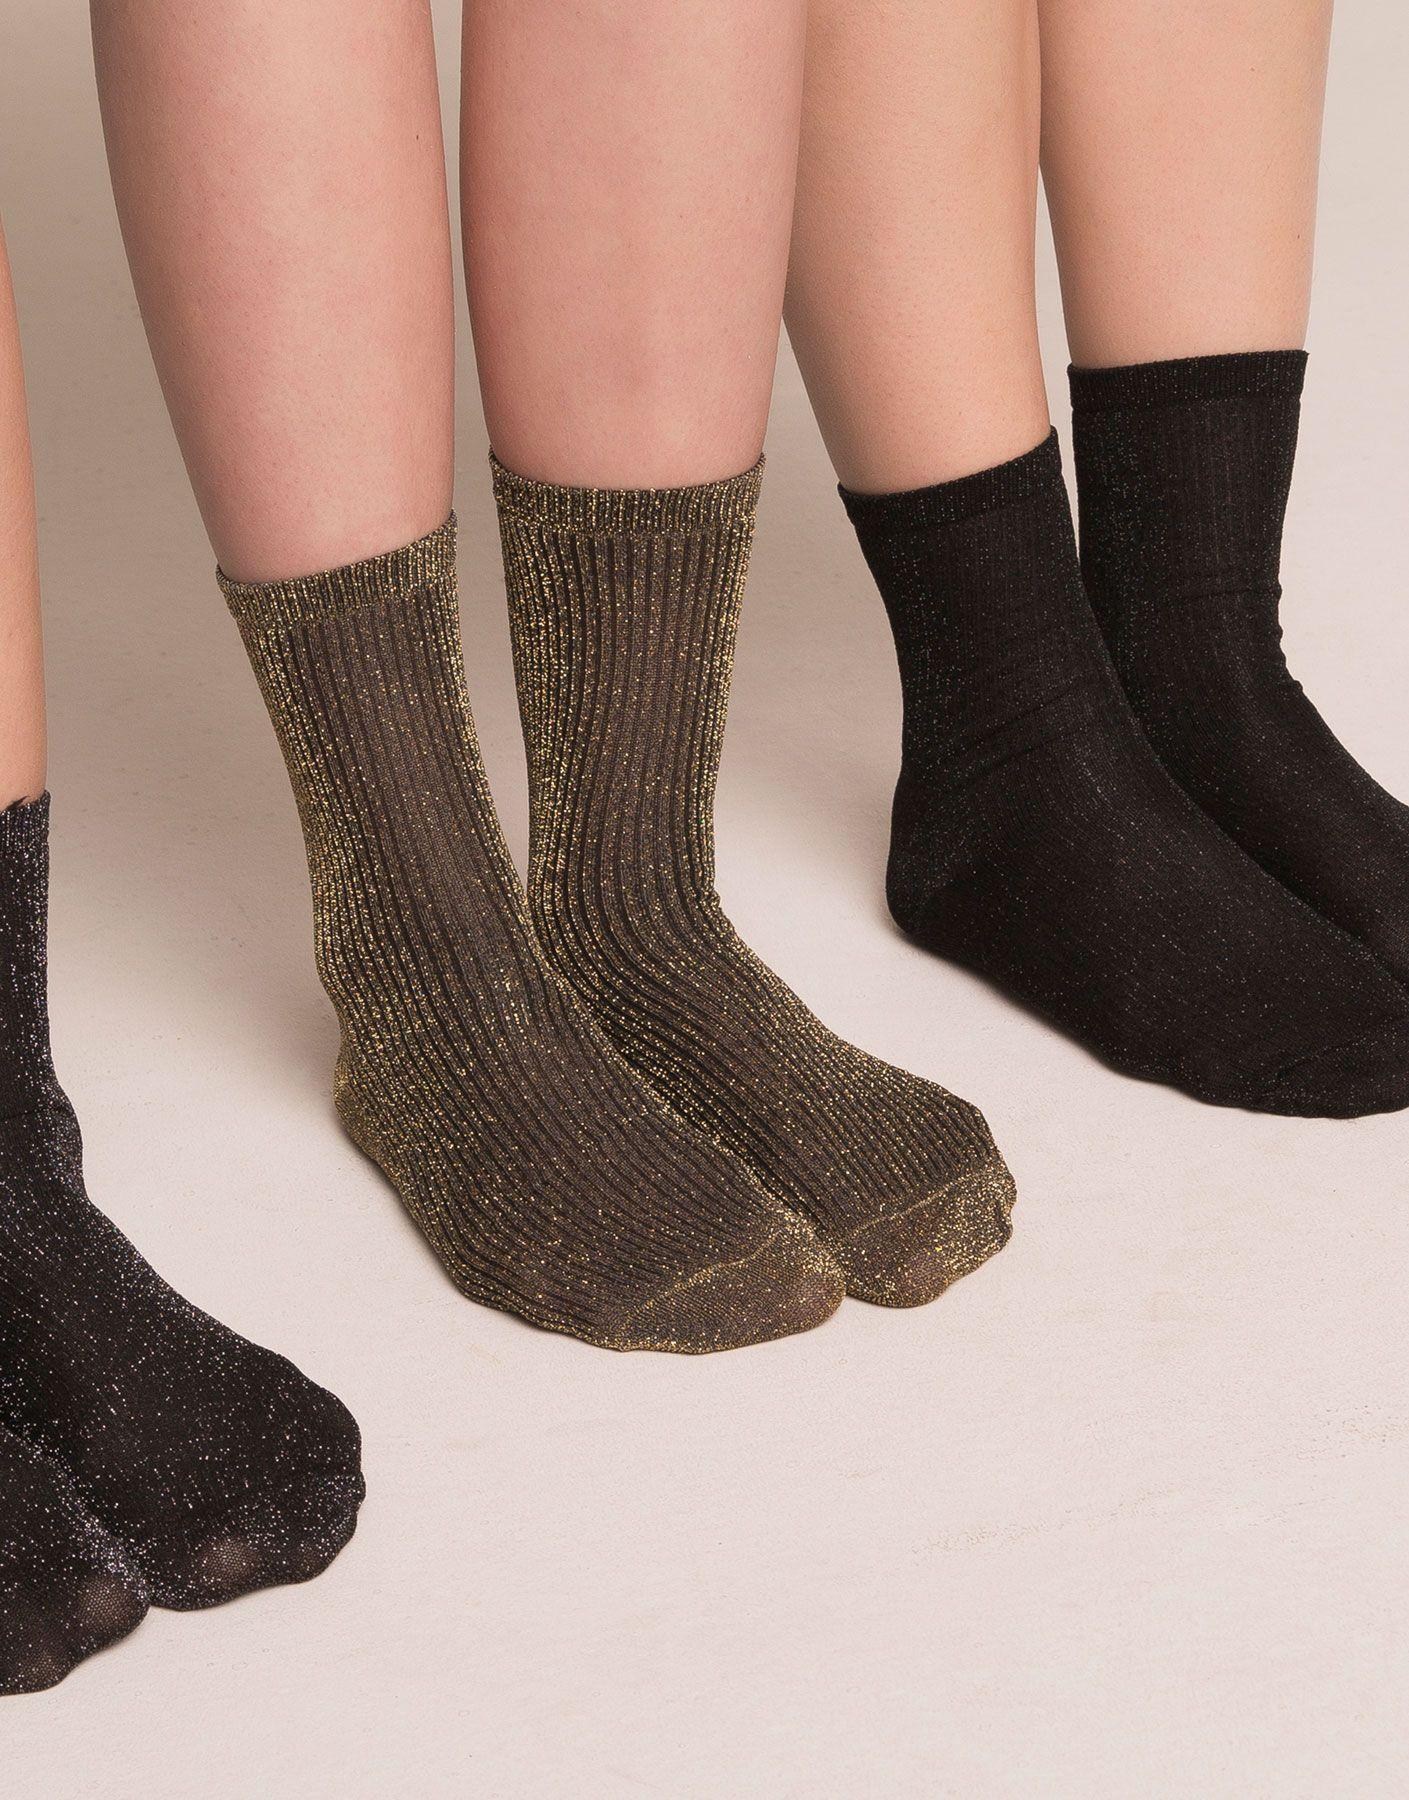 chaussettes effet brillant collants et chaussettes femme pull bear france wishlist. Black Bedroom Furniture Sets. Home Design Ideas